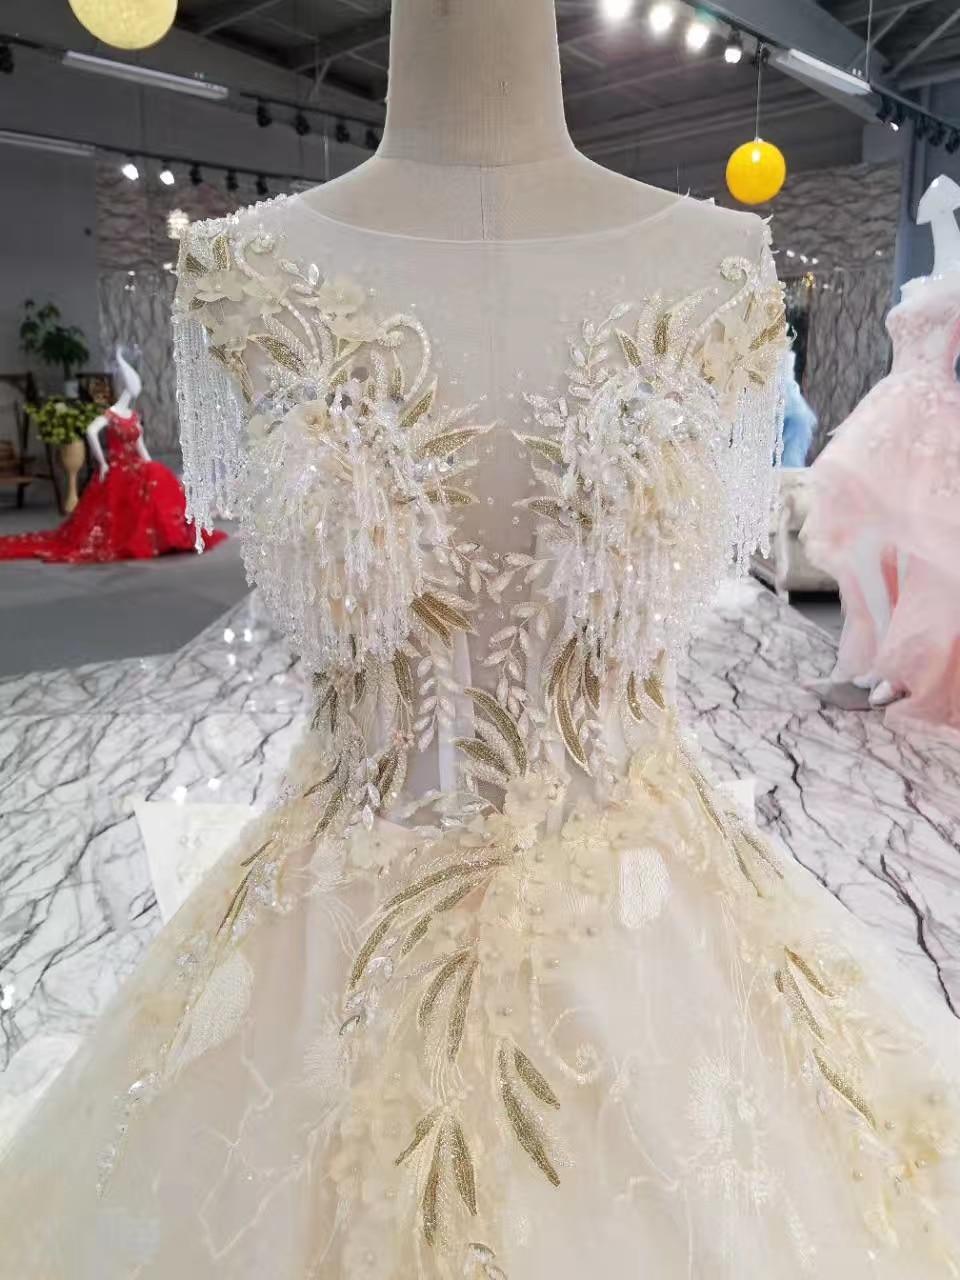 Lace Crystals de lux Margele de aplicatii rochie de mireasa rochie de - Rochii de mireasa - Fotografie 3